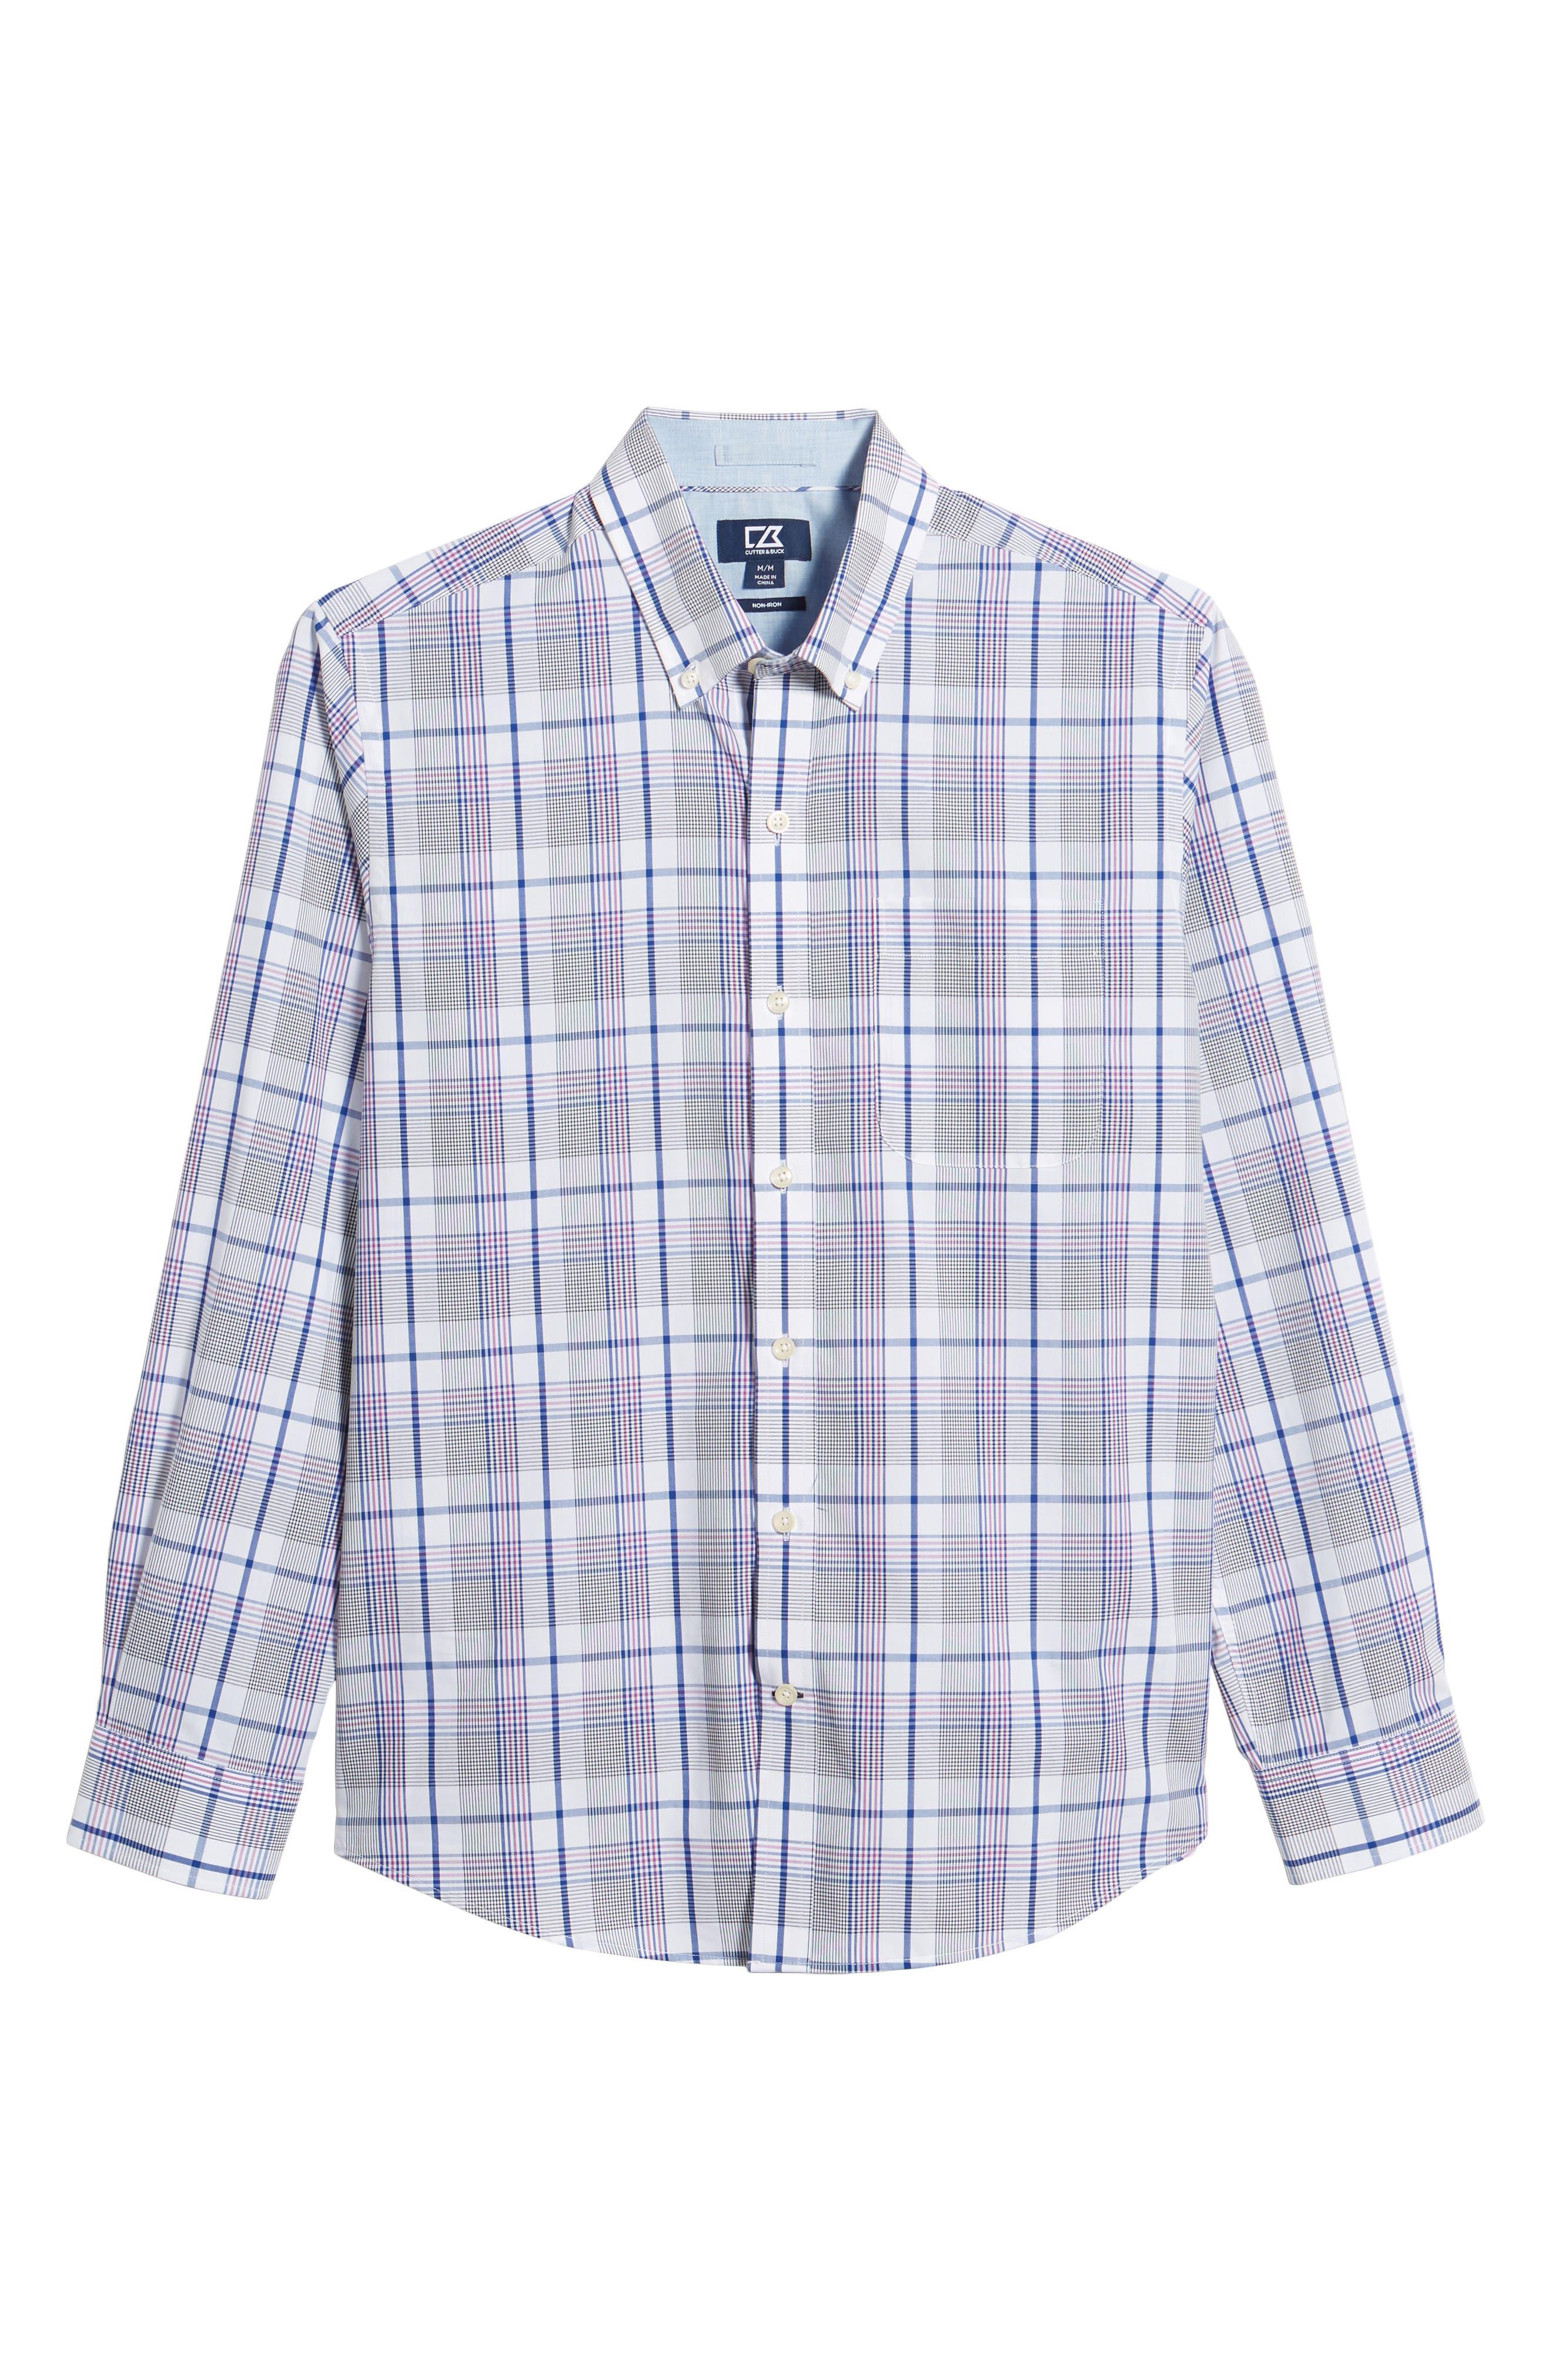 Aidan Non-Iron Plaid Sport Shirt,                             Alternate thumbnail 6, color,                             419